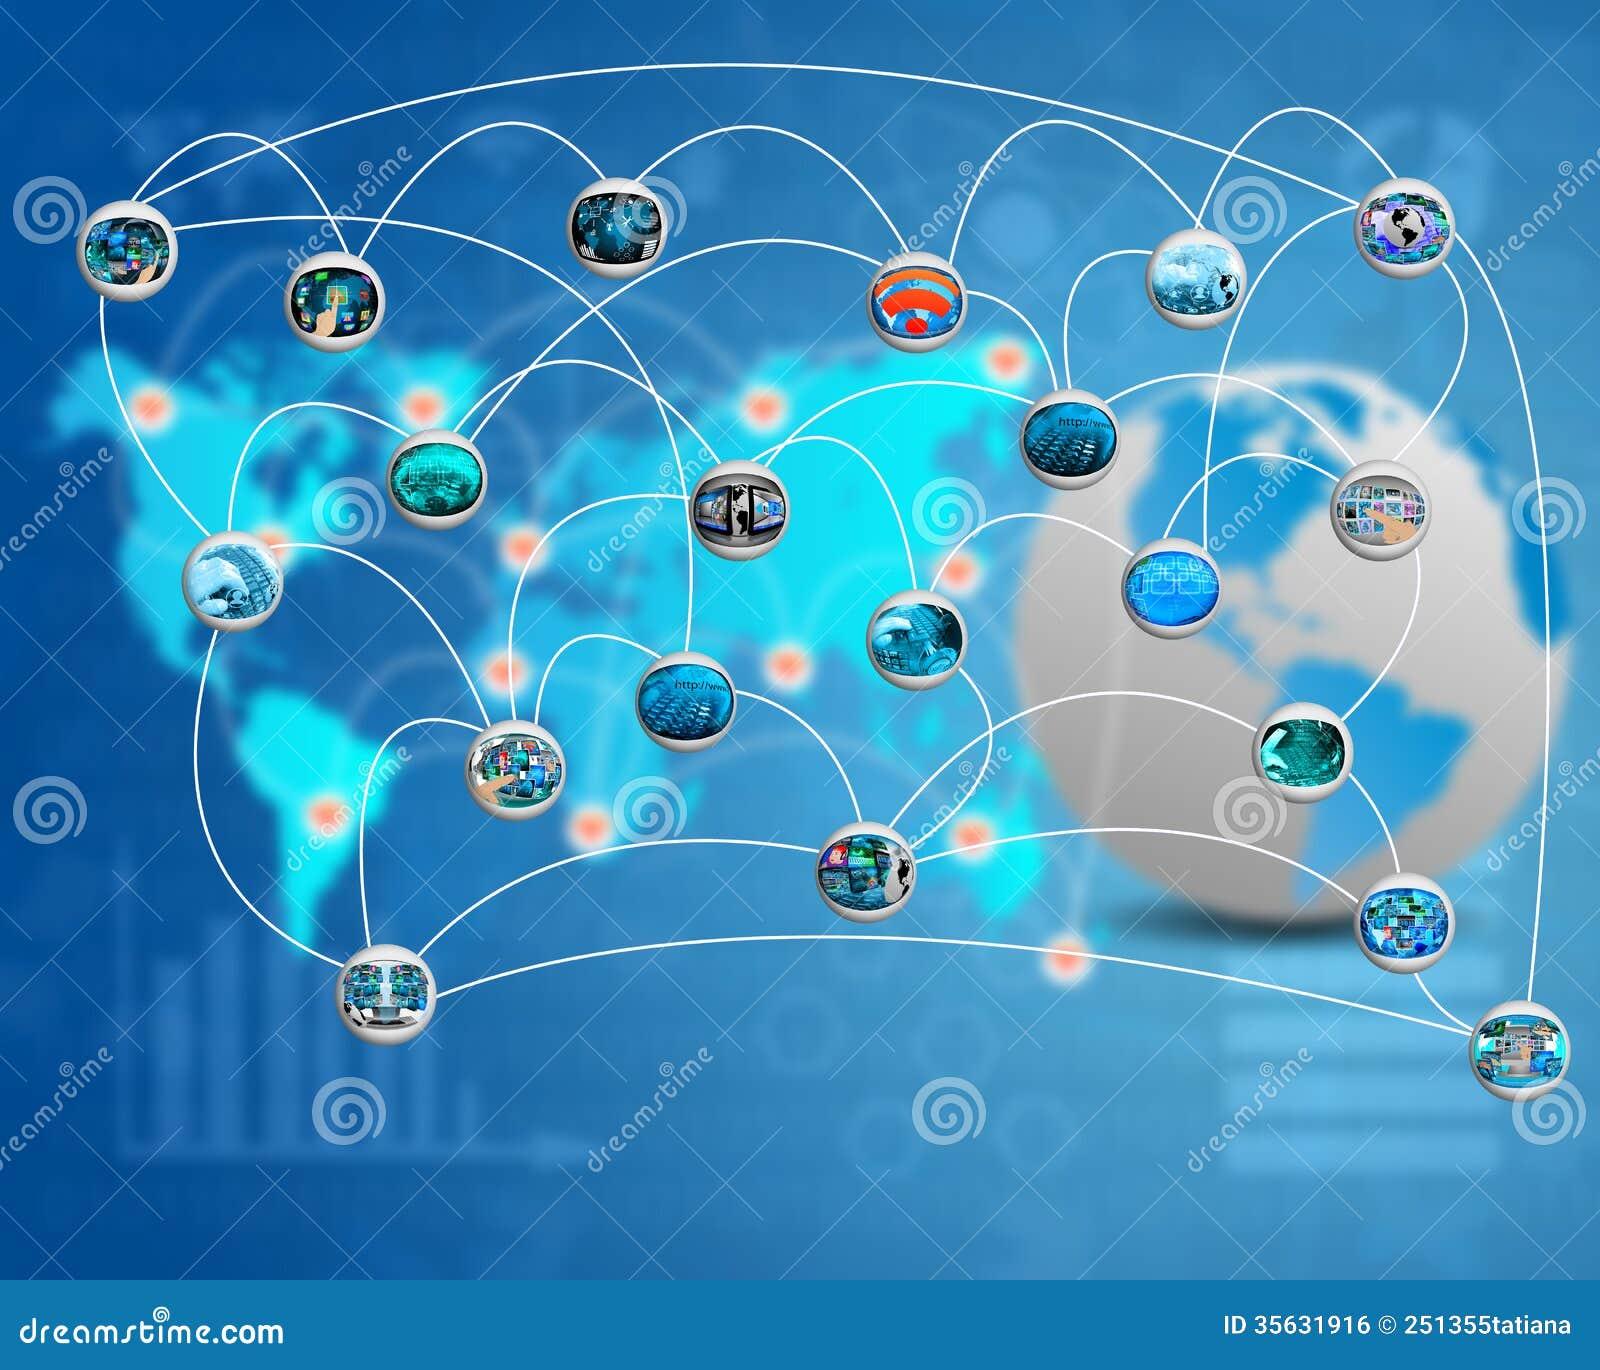 Network international ipo share price